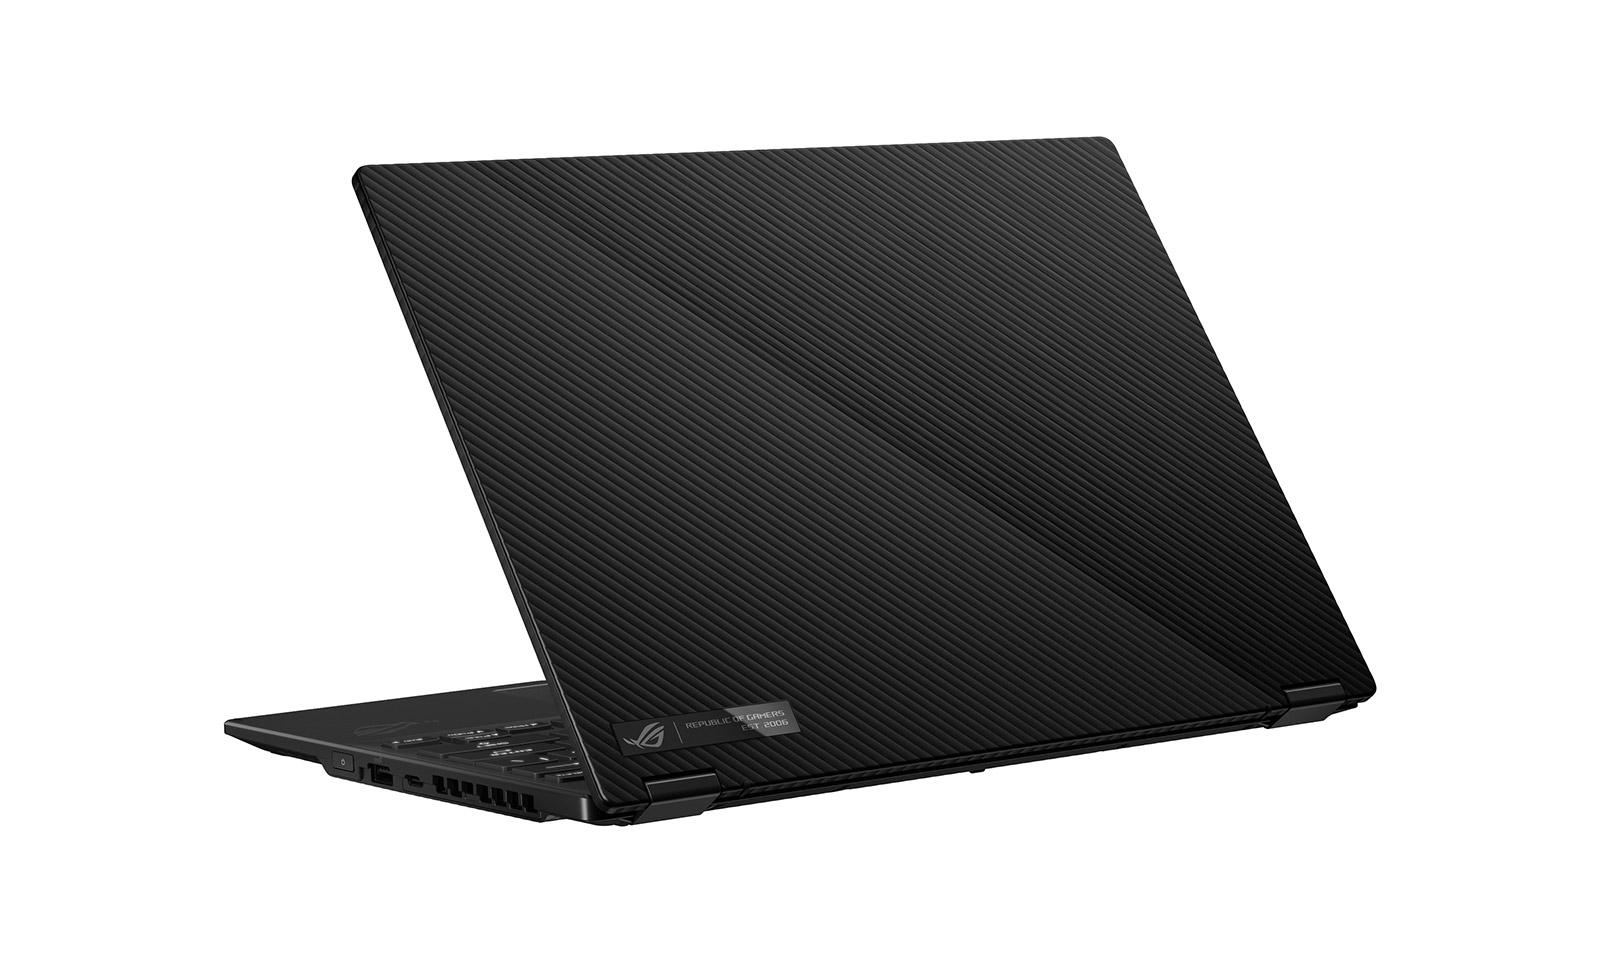 Laptopul de gaming convertibil ROG Flow X13